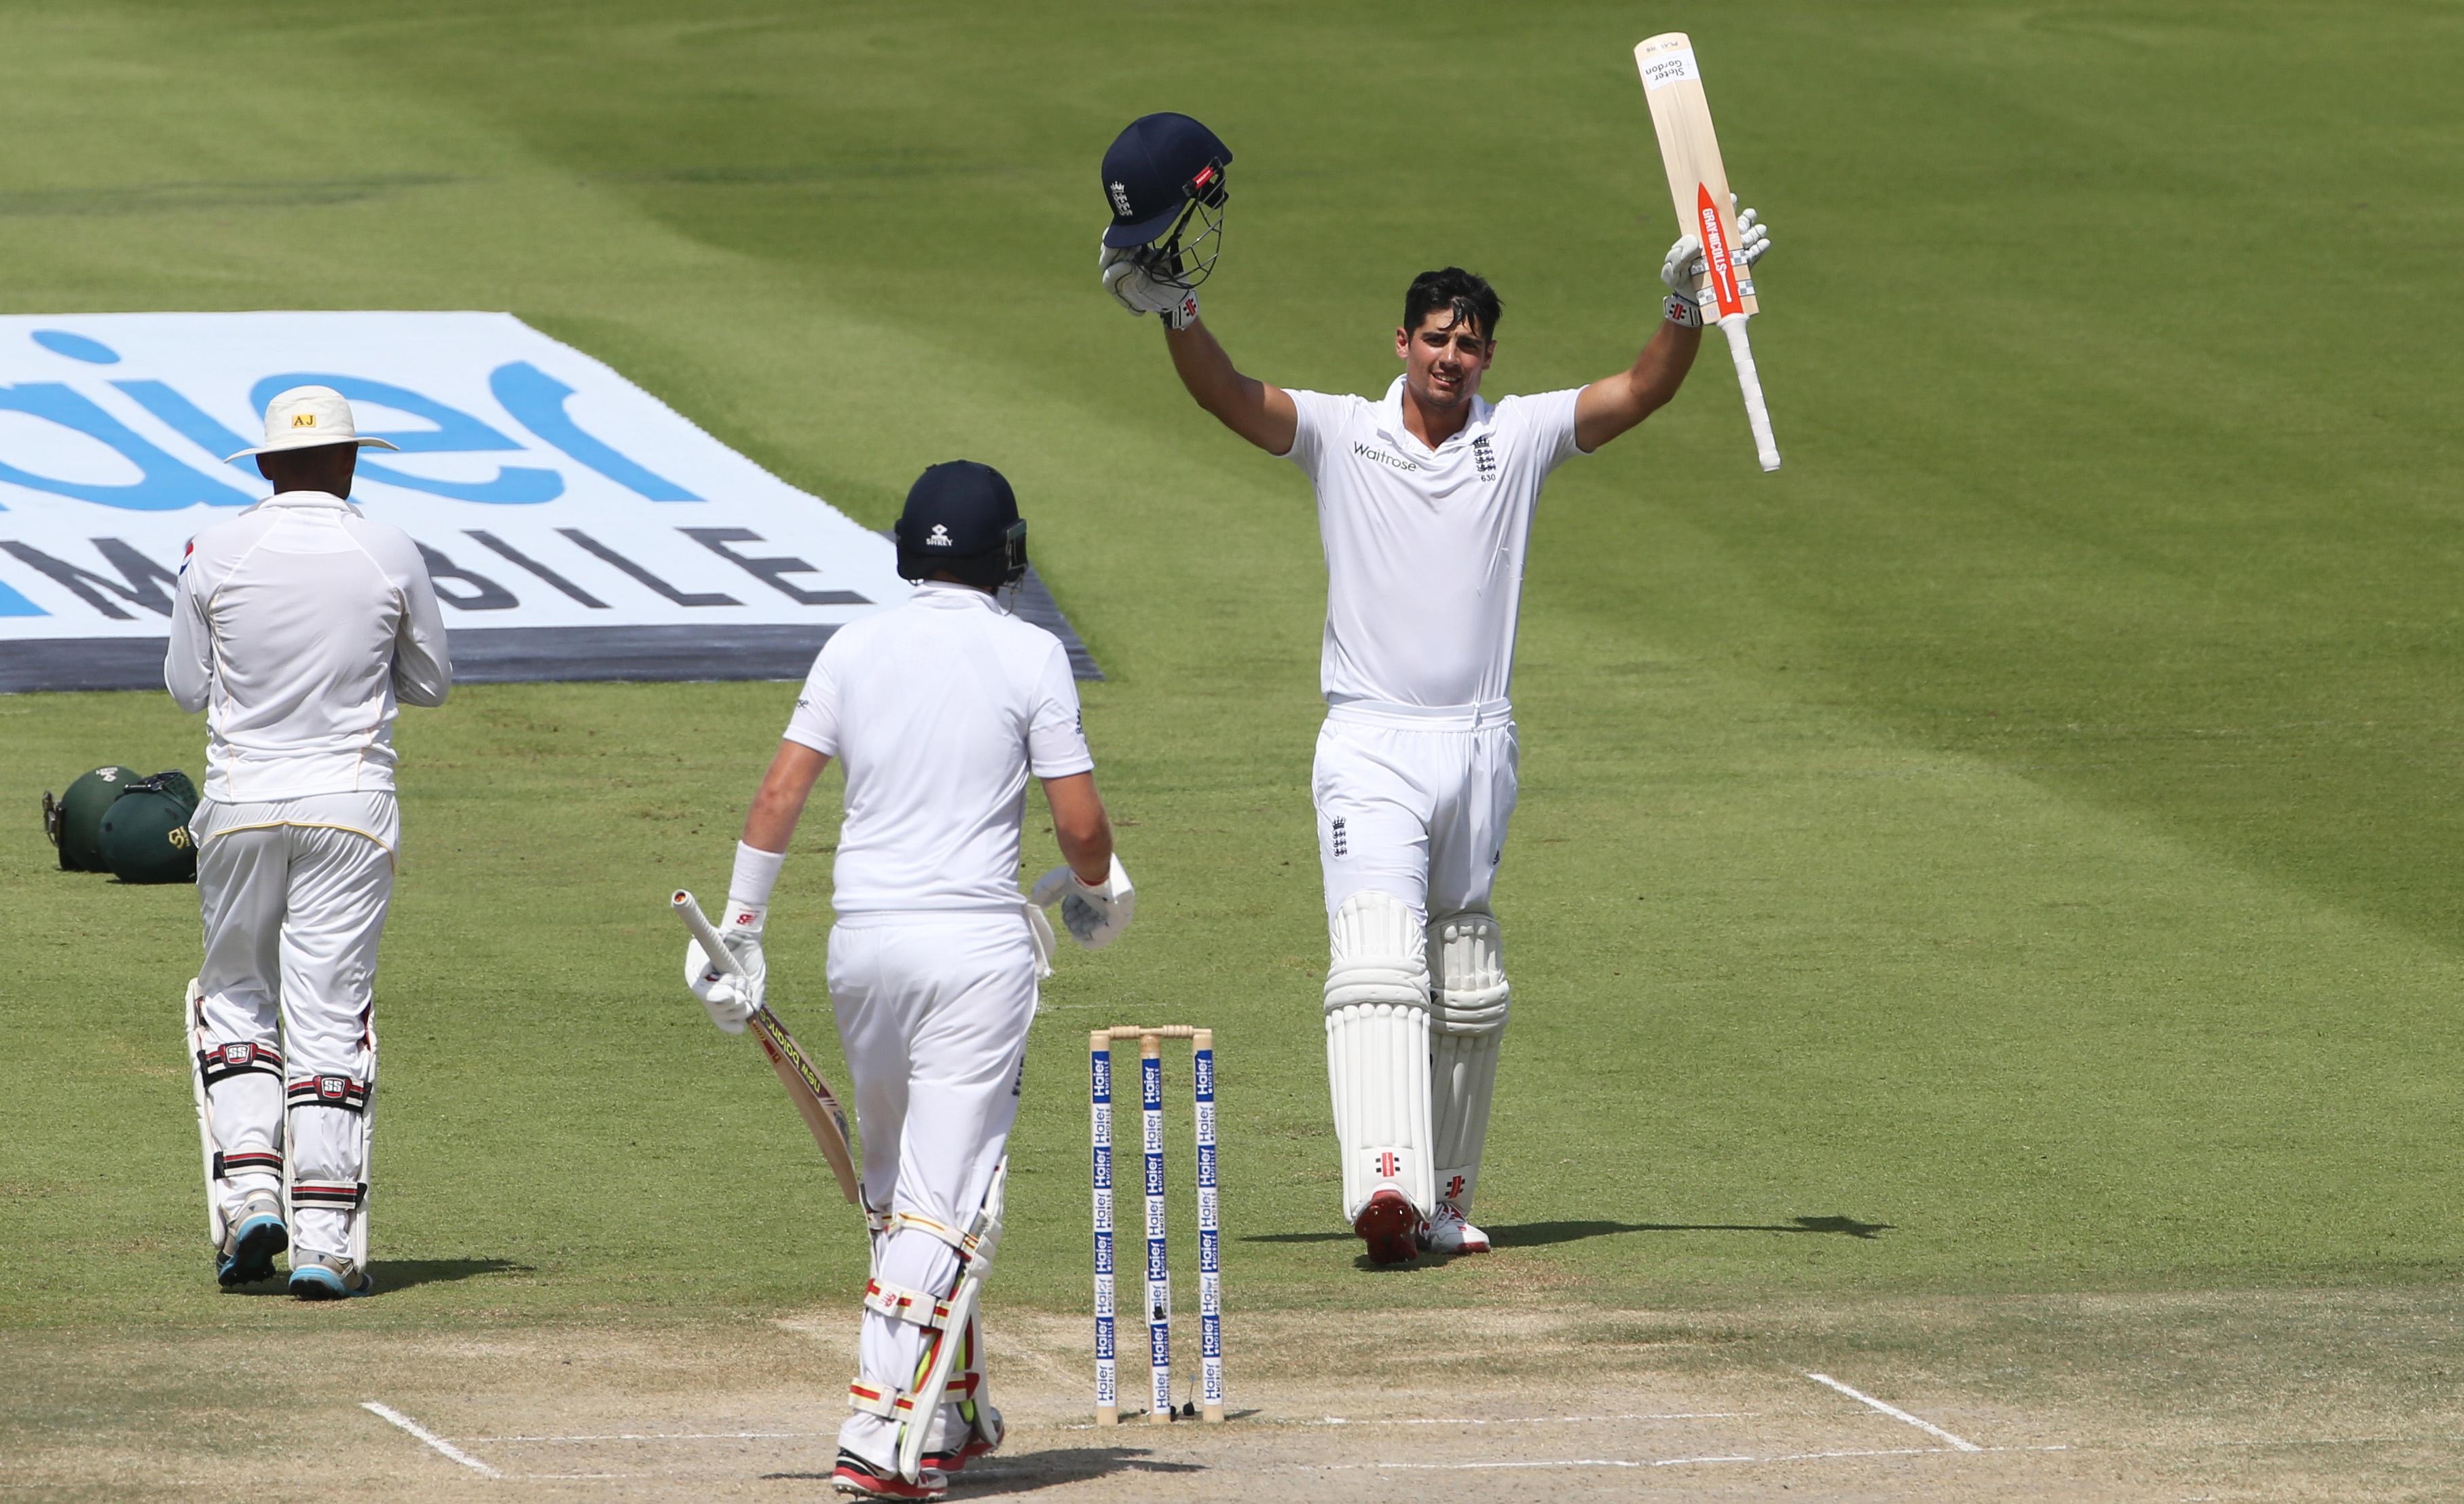 Cricket - Pakistan v England - First Test - Zayed Cricket Stadium, Abu Dhabi, United Arab Emirates - 16/10/15nEngland's Alastair Cook celebrates reaching his double centurynAction Images via Reuters / Jason O'BriennLivepic